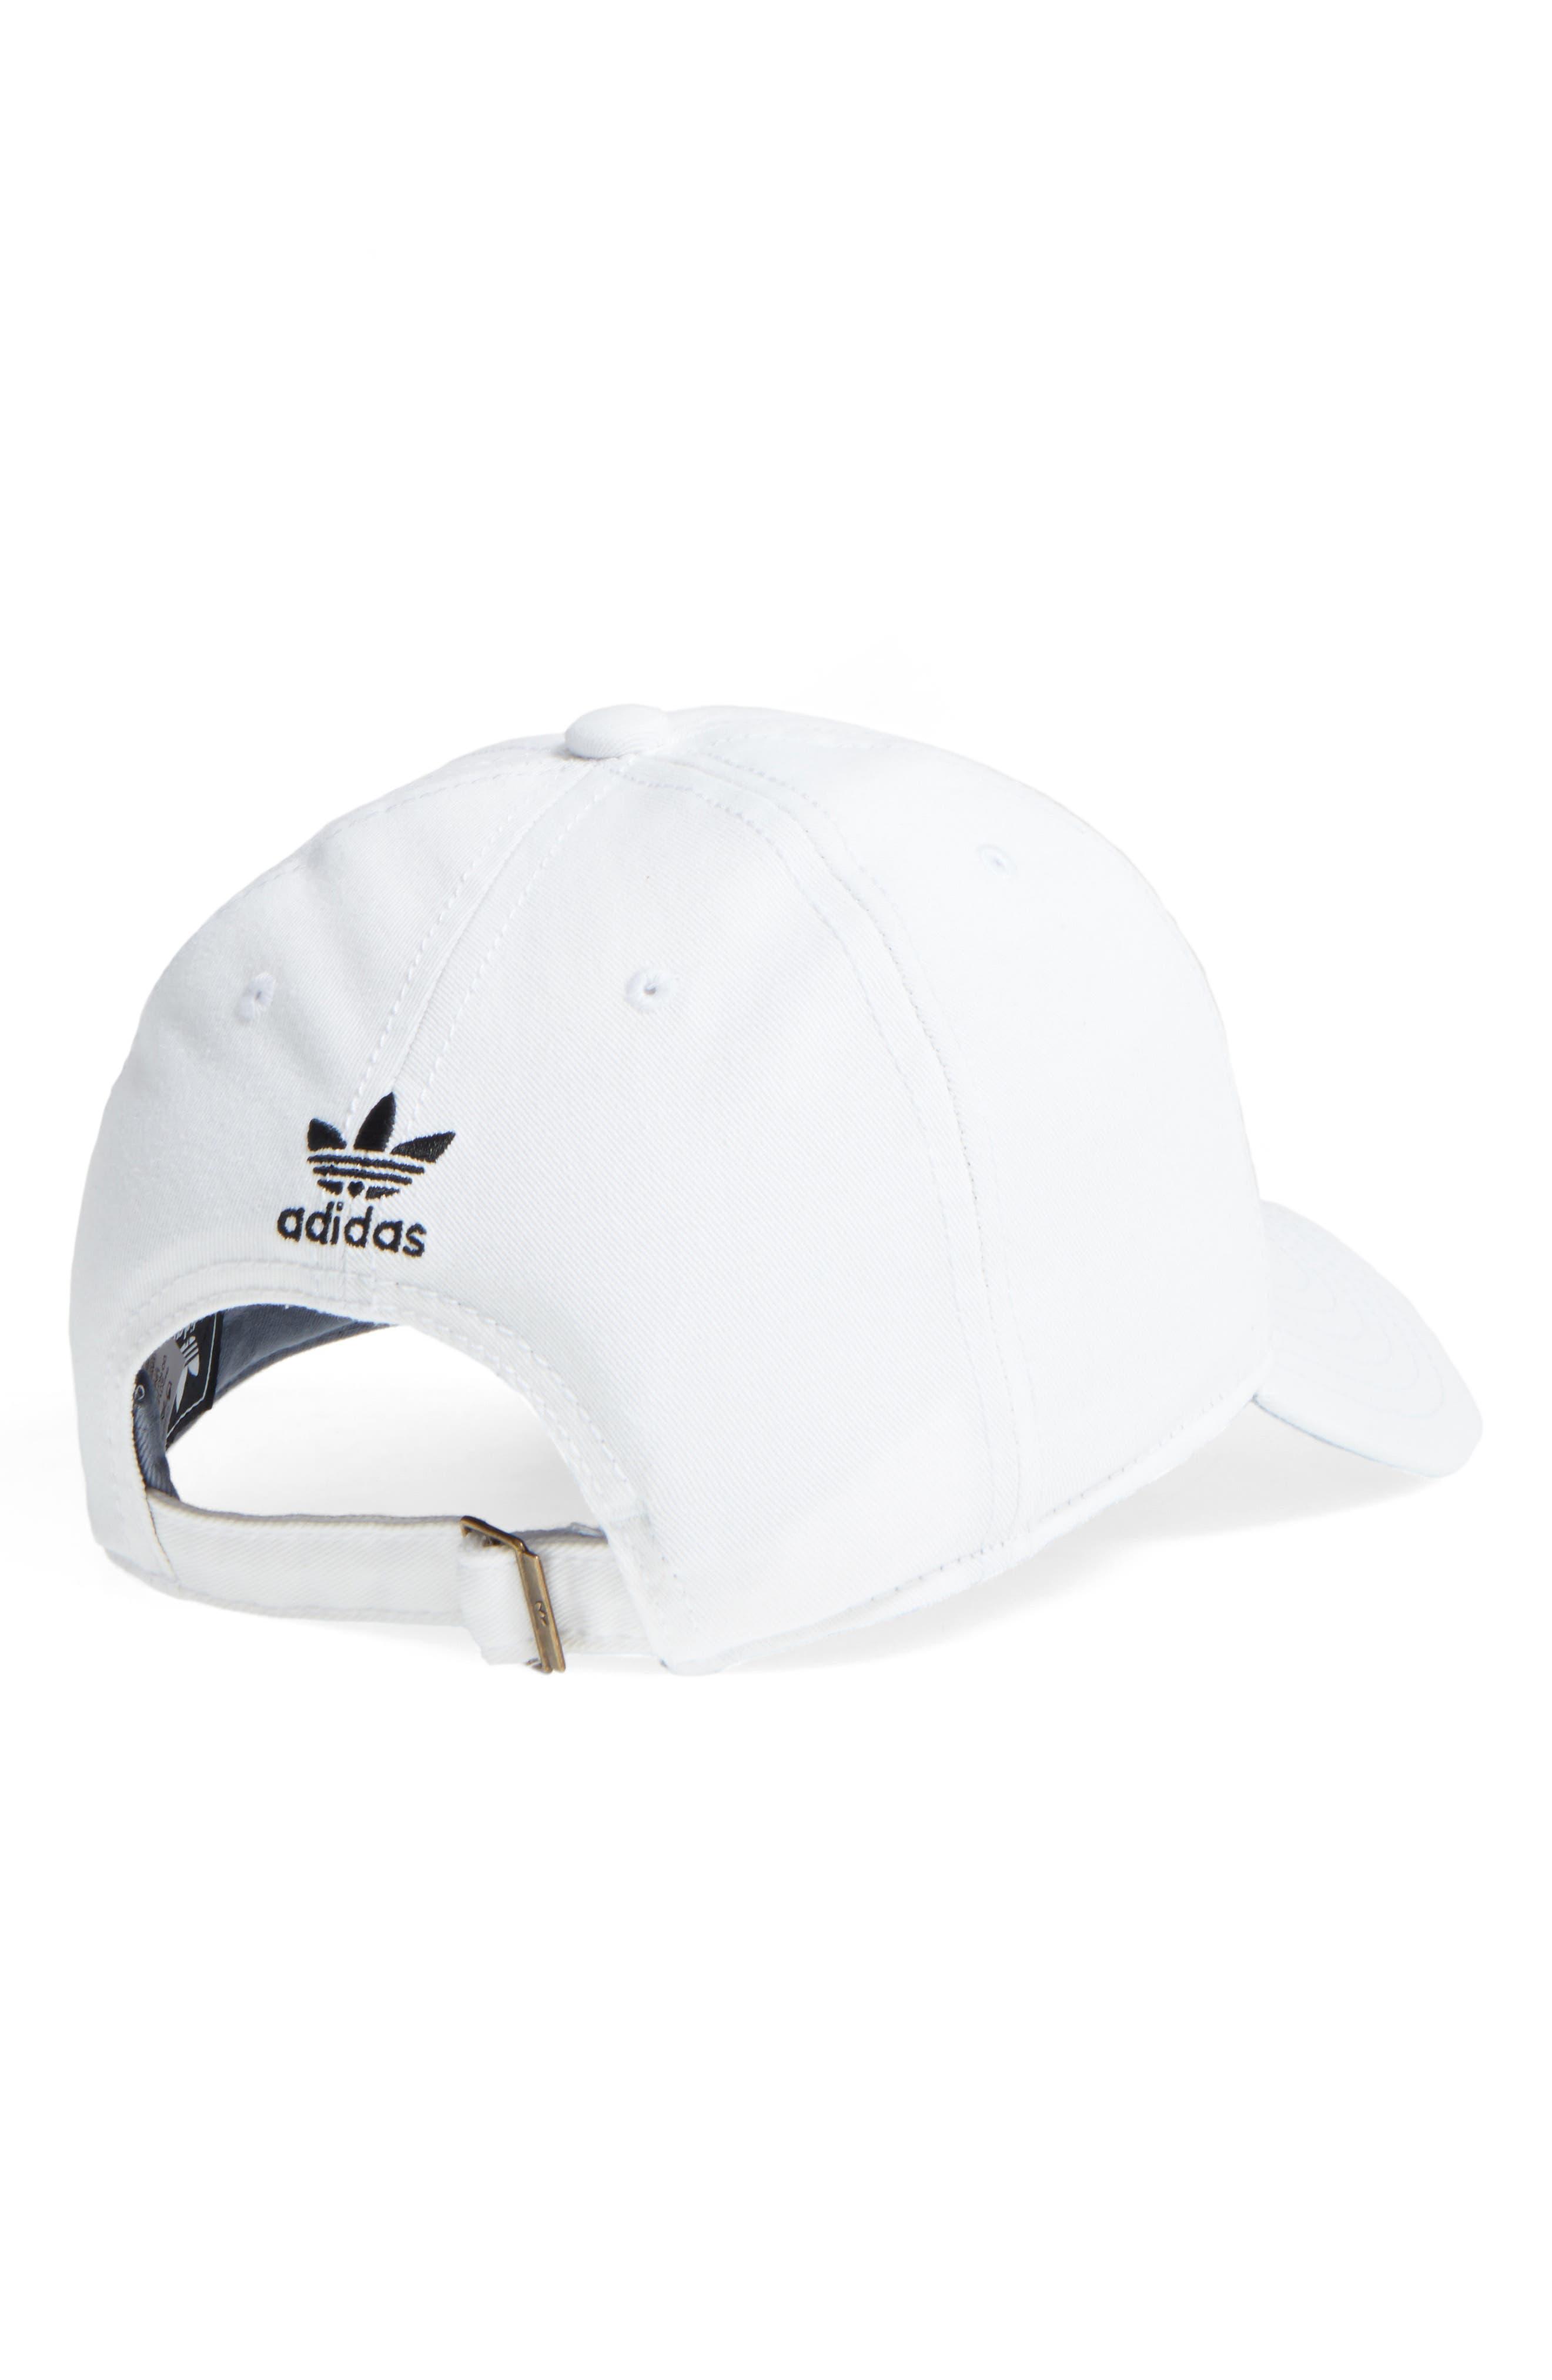 53ae56d735b Baseball Cap Hats for Women